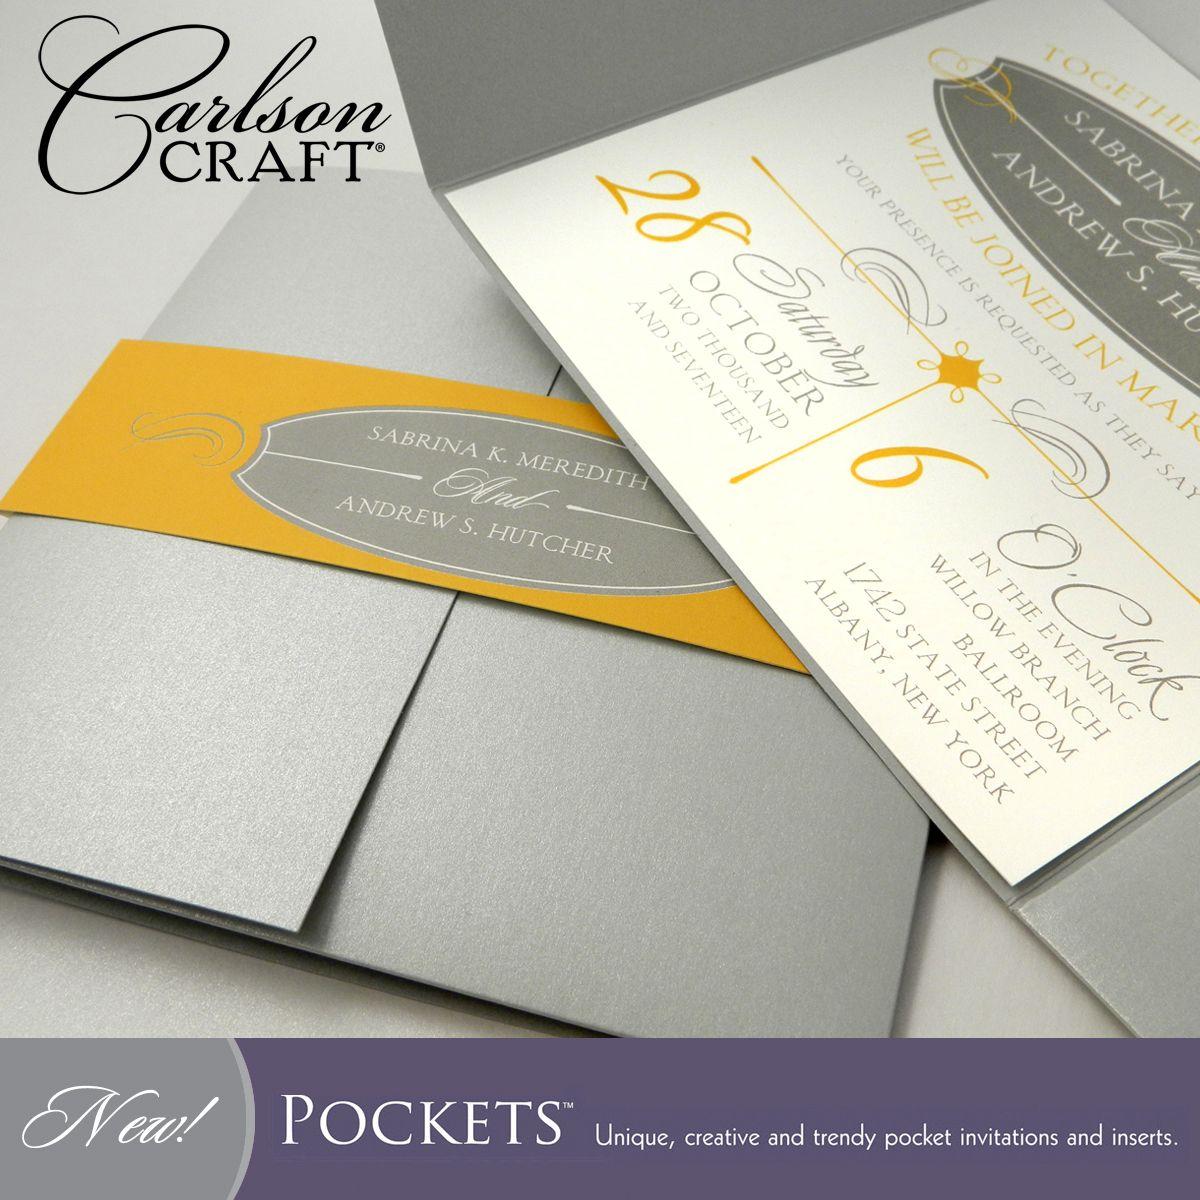 Carlson Craft Pocket Wedding Invitations: Pocket Wedding Invitations, Wedding Invitations